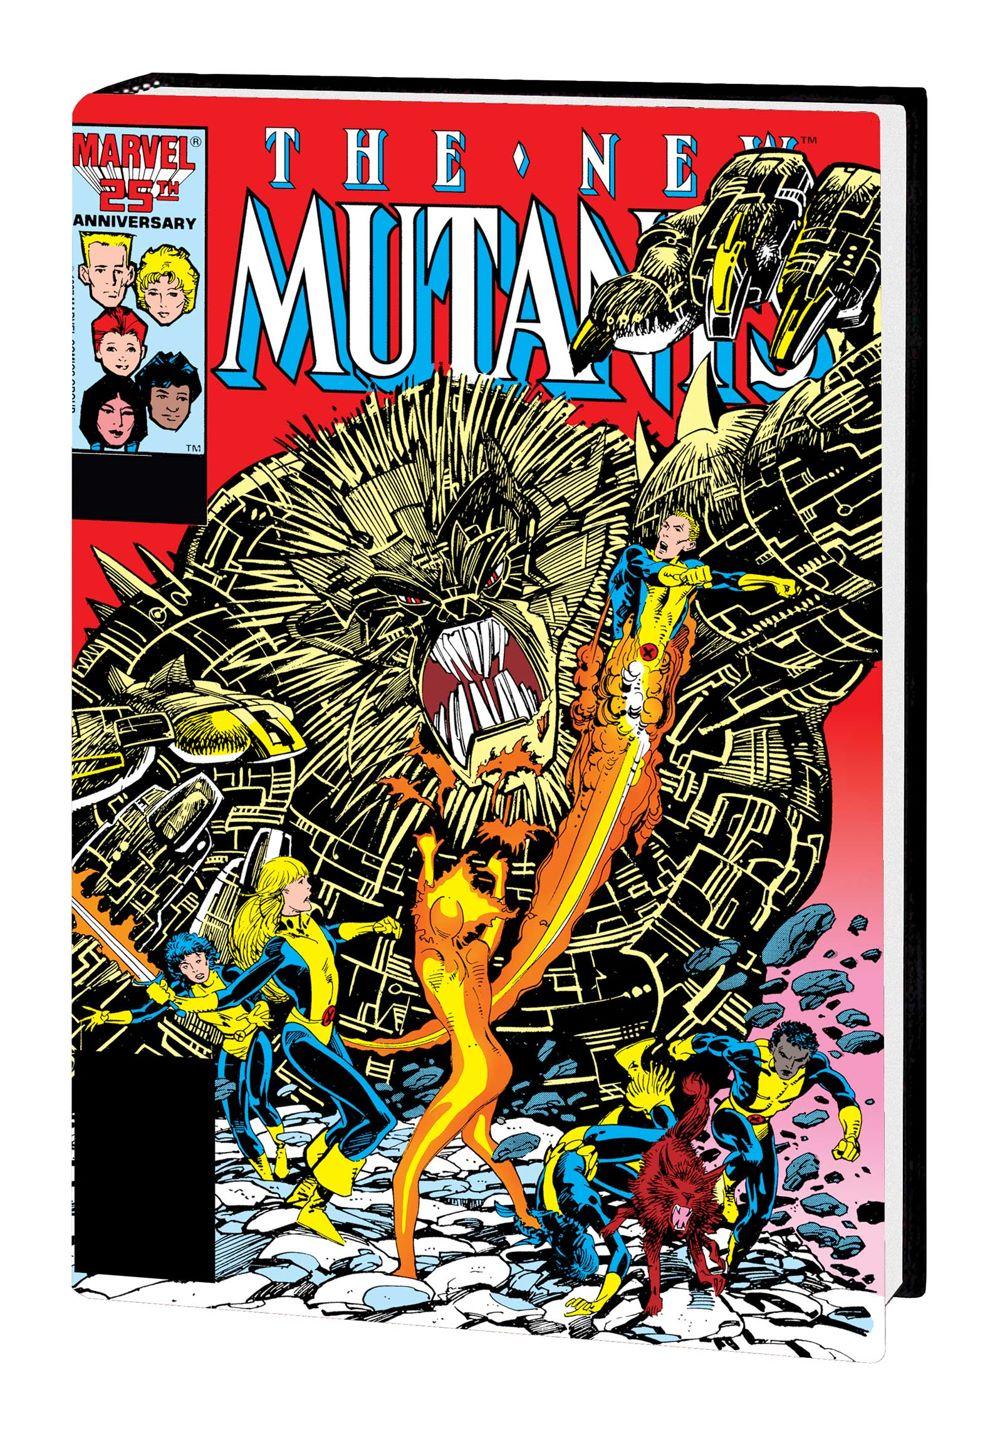 NEW_MUTANTS_VOL_2_OMNI_HC_WINDSOR_SMITH Marvel Comics August 2021 Solicitations